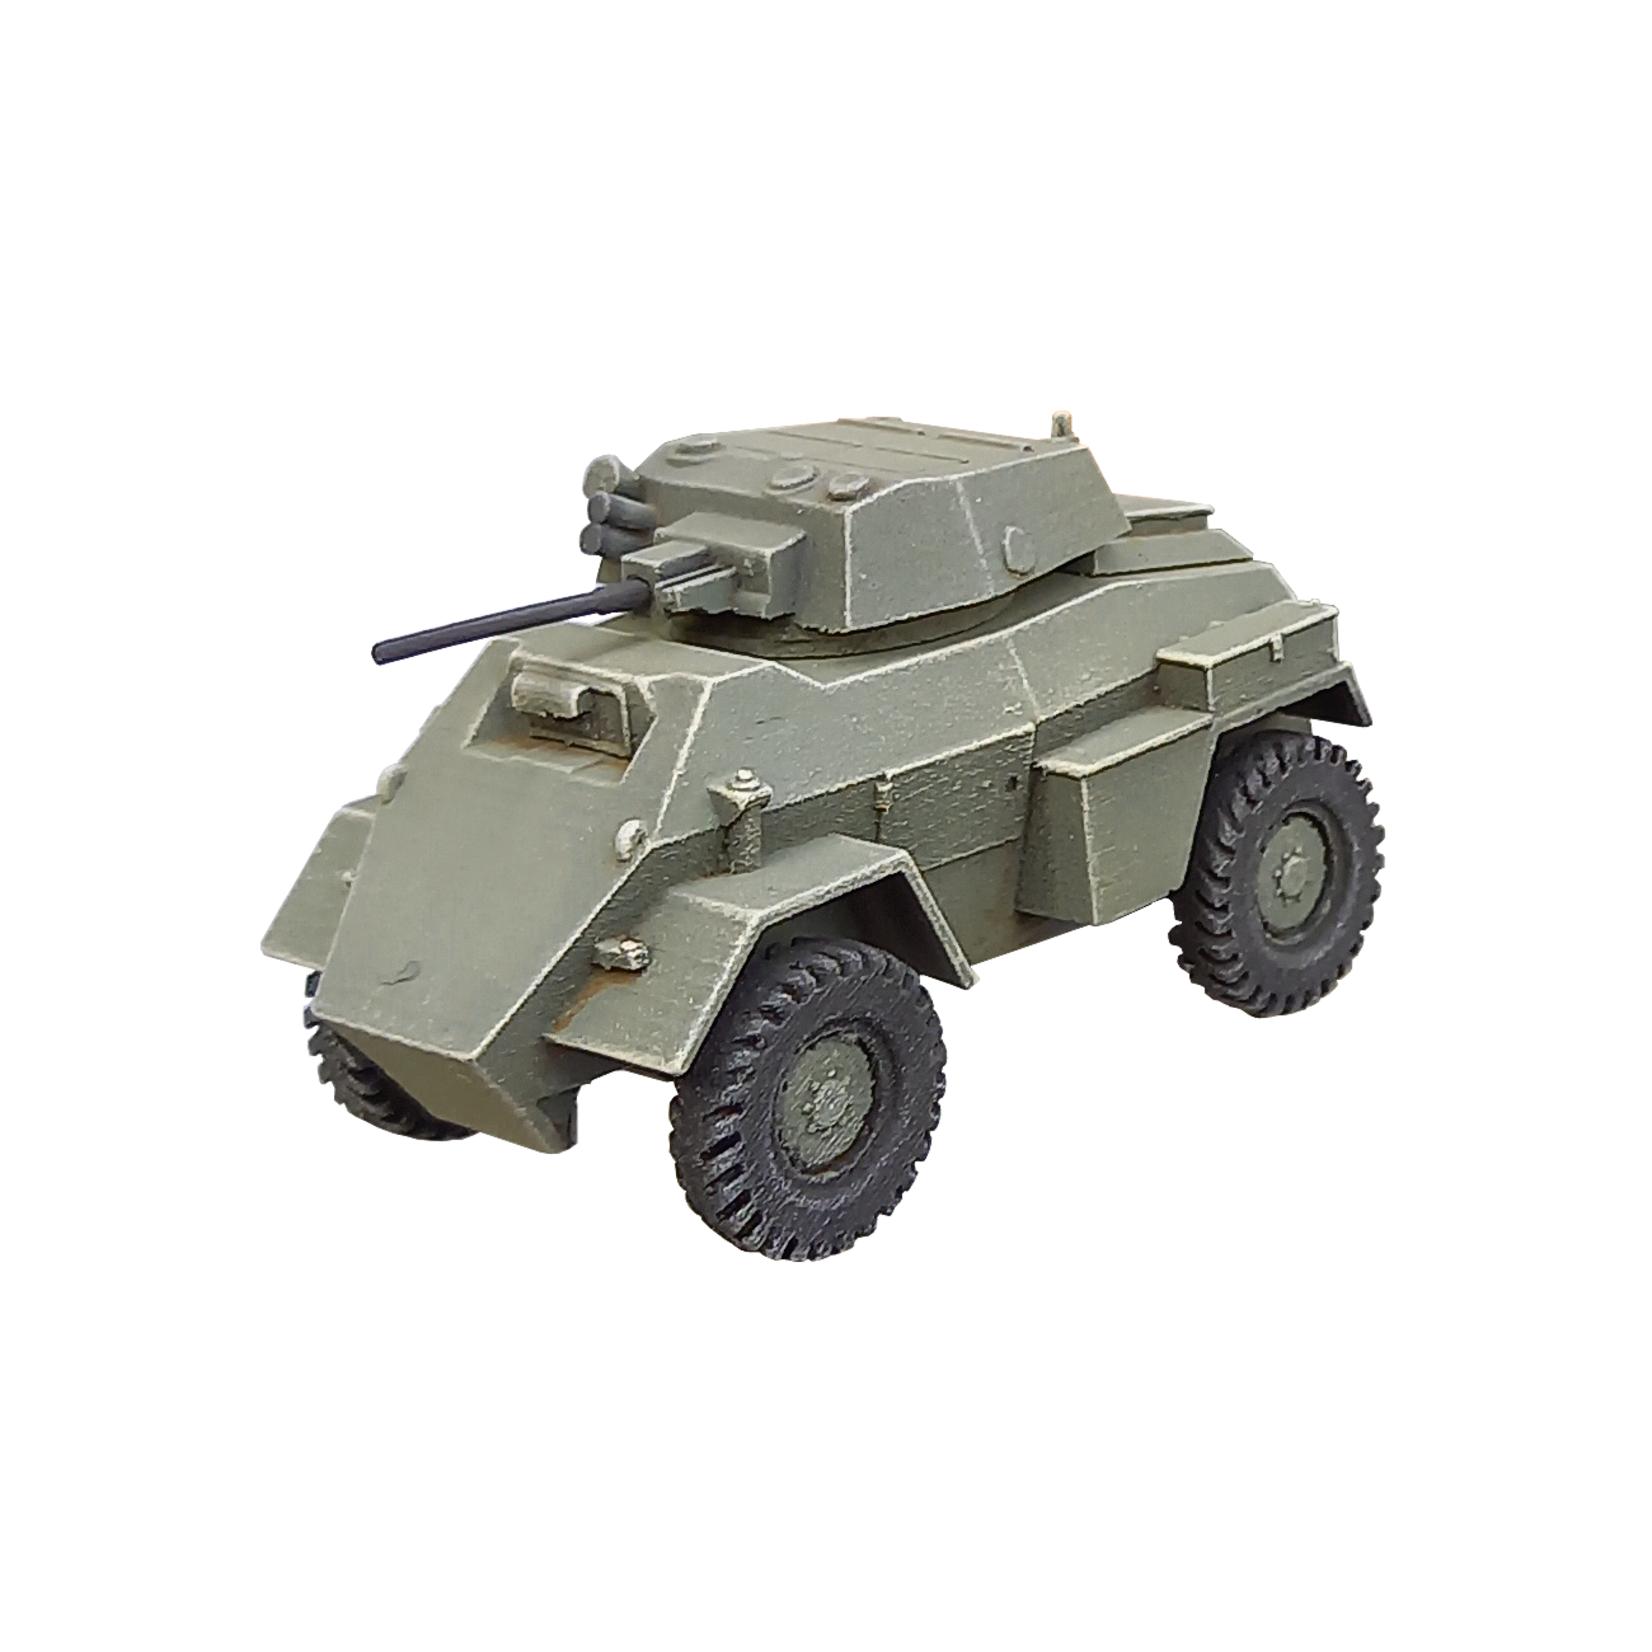 Humber Mark IV